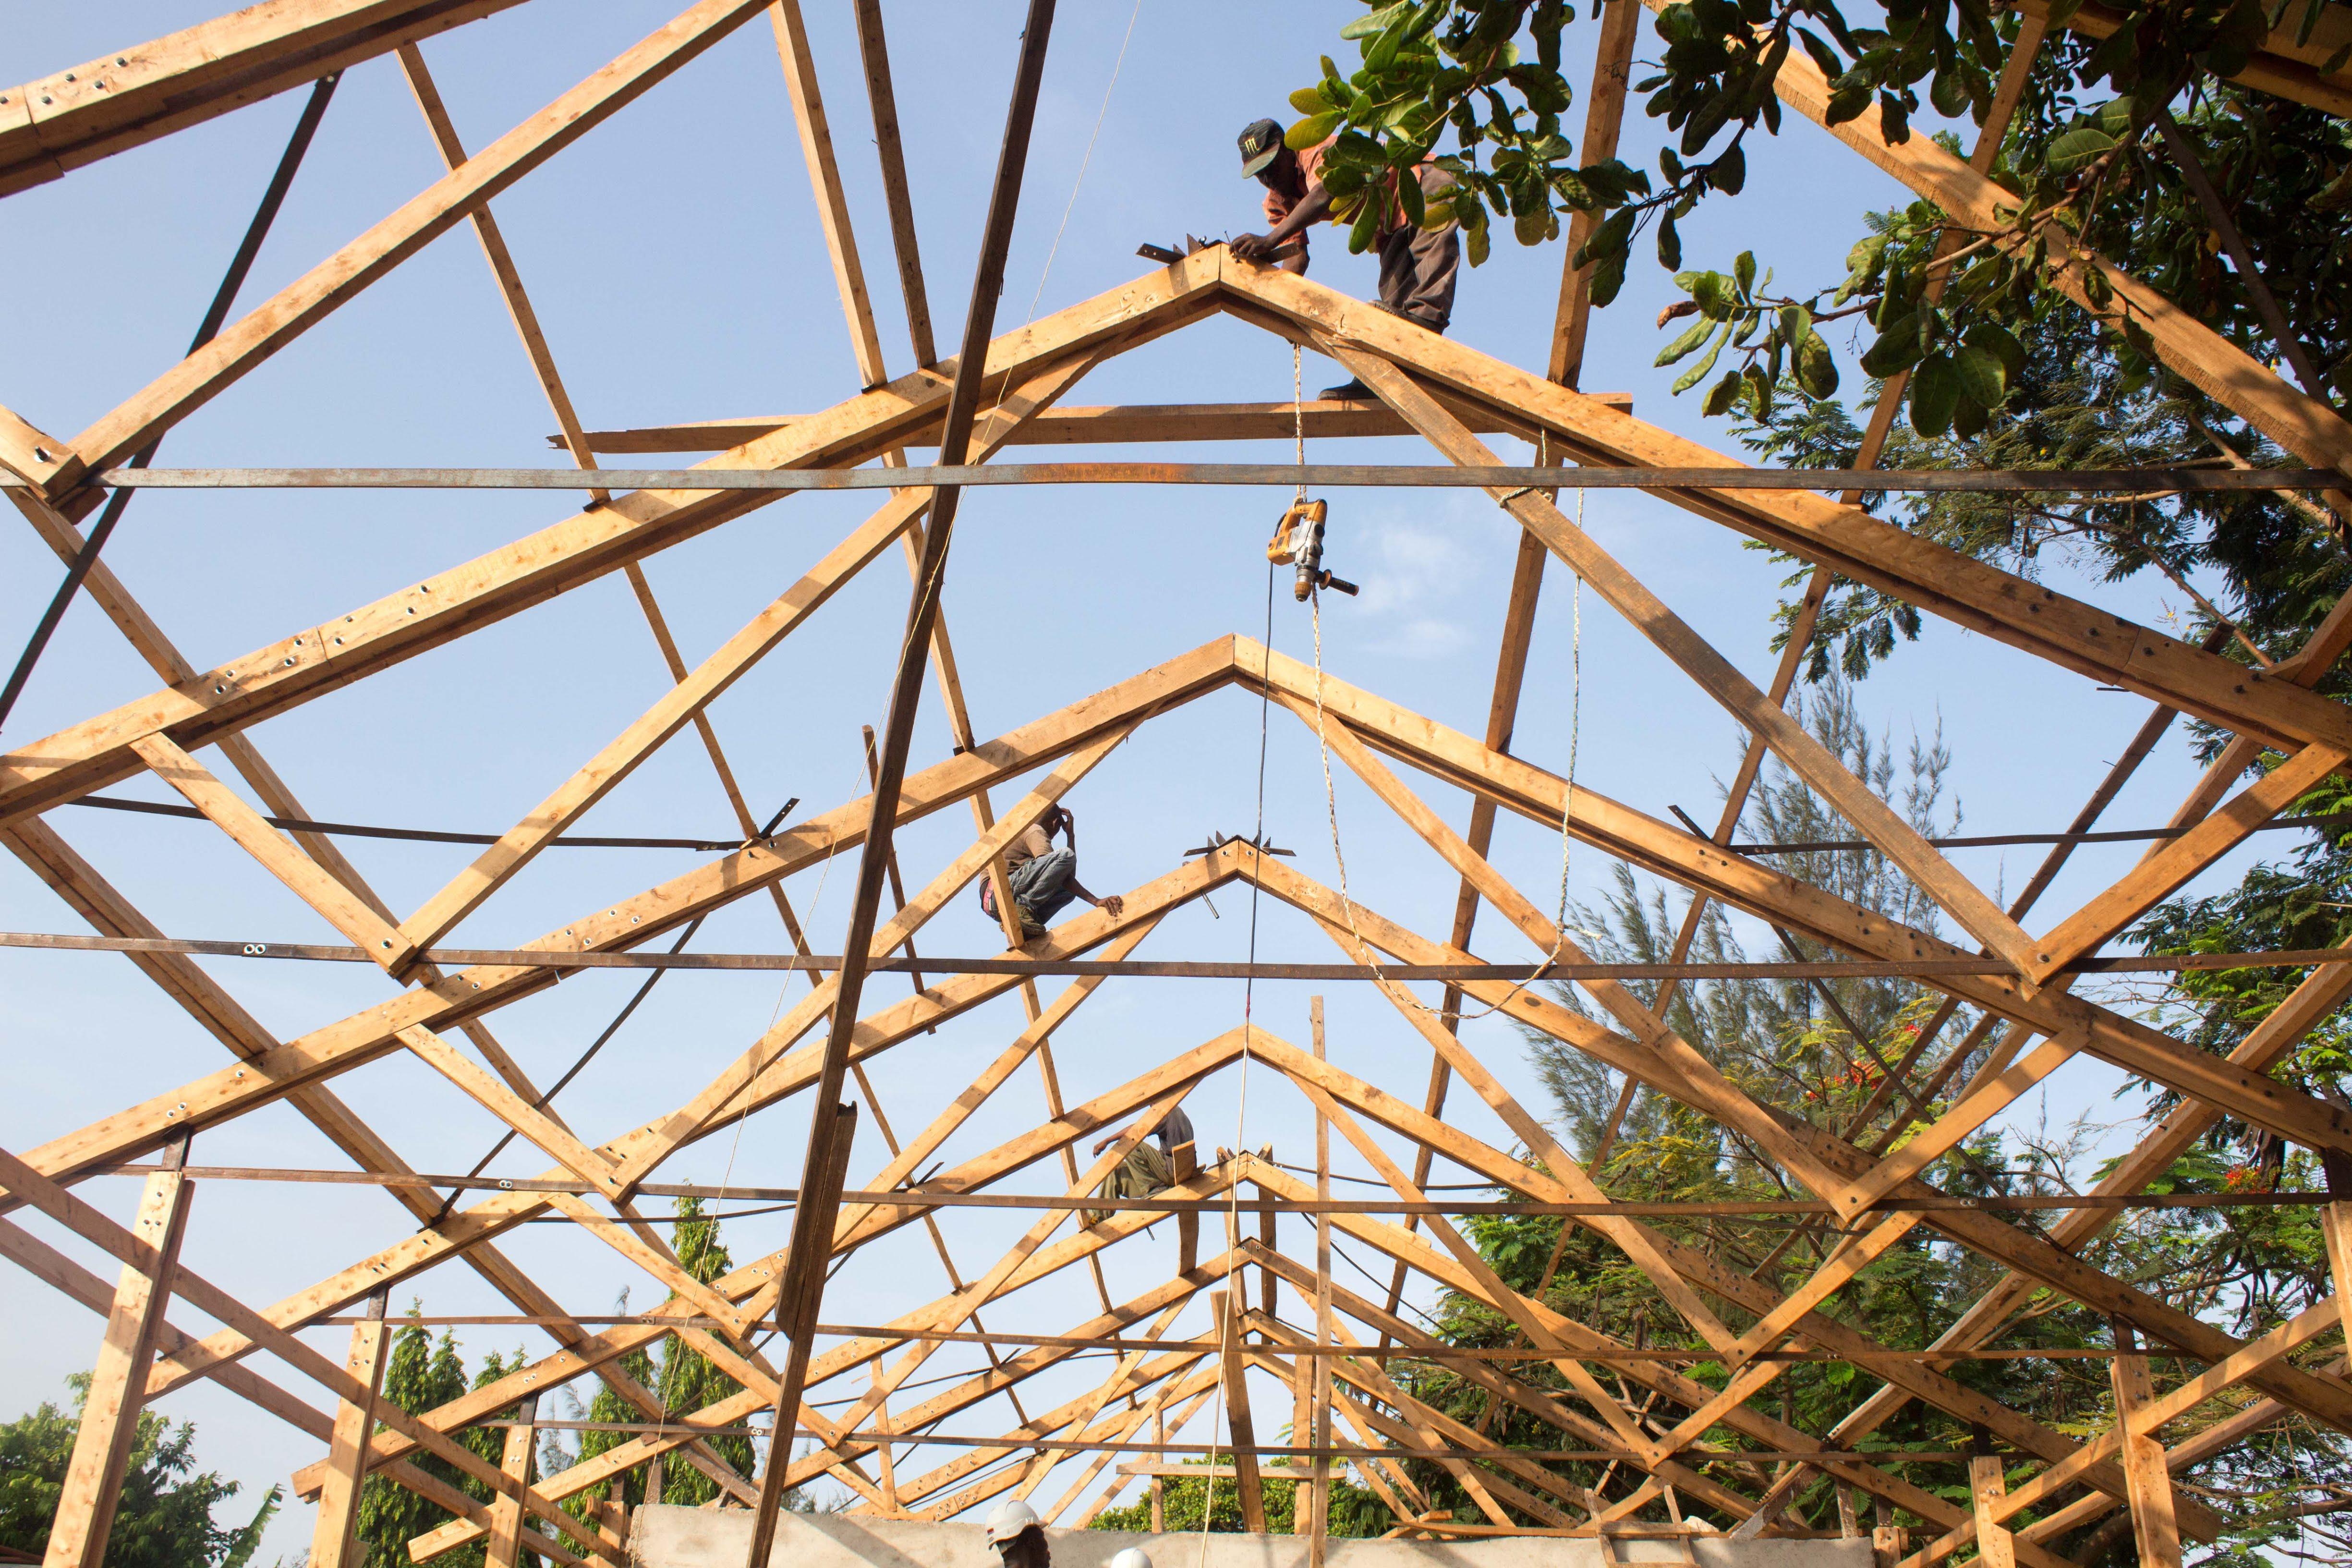 destiny garden school timber roof structure kenya engineering architecture